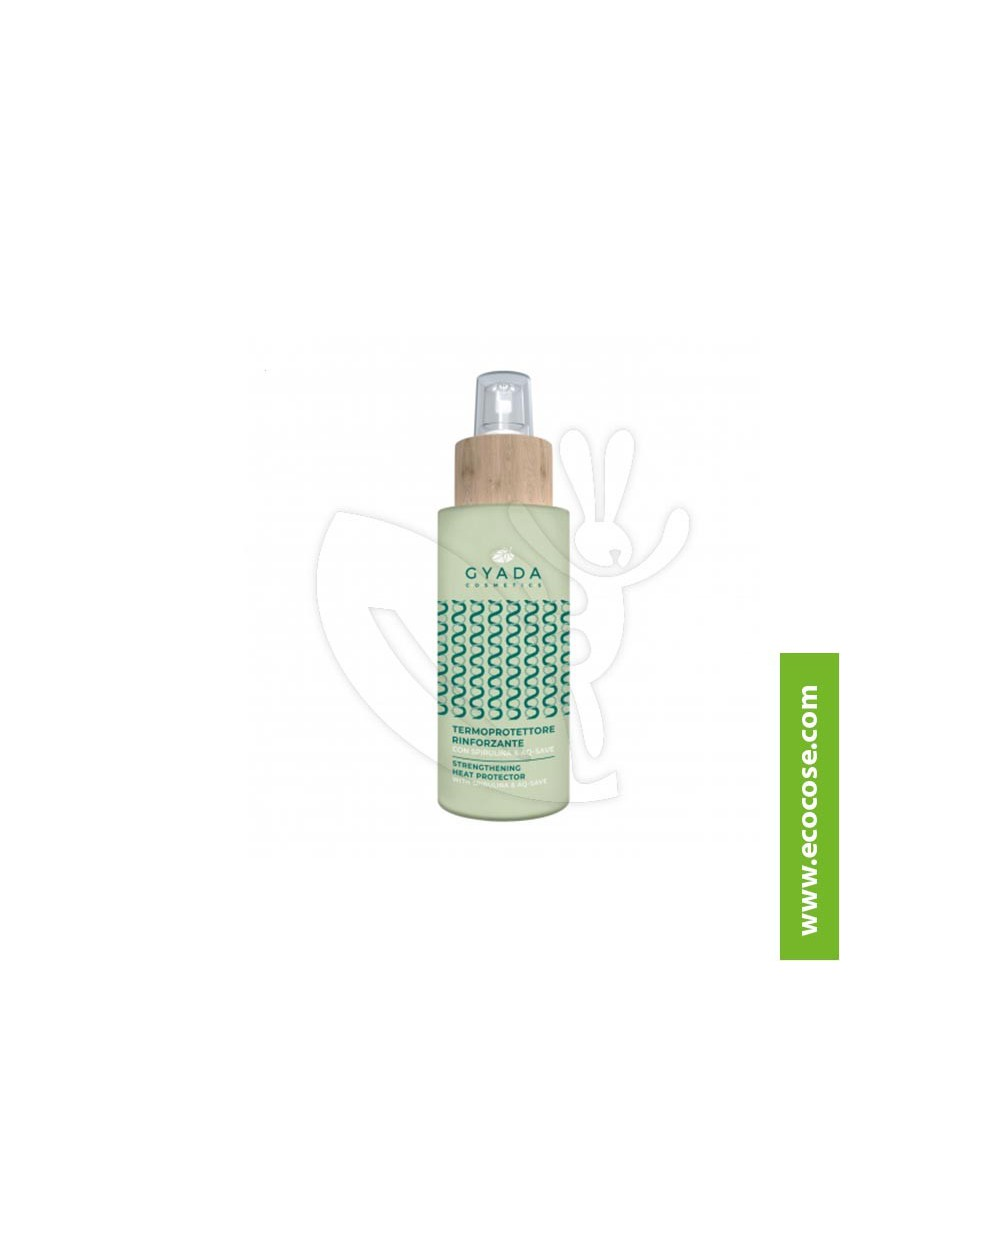 Gyada Cosmetics - Termoprotettore rinforzante con spirulina e AQ-Save